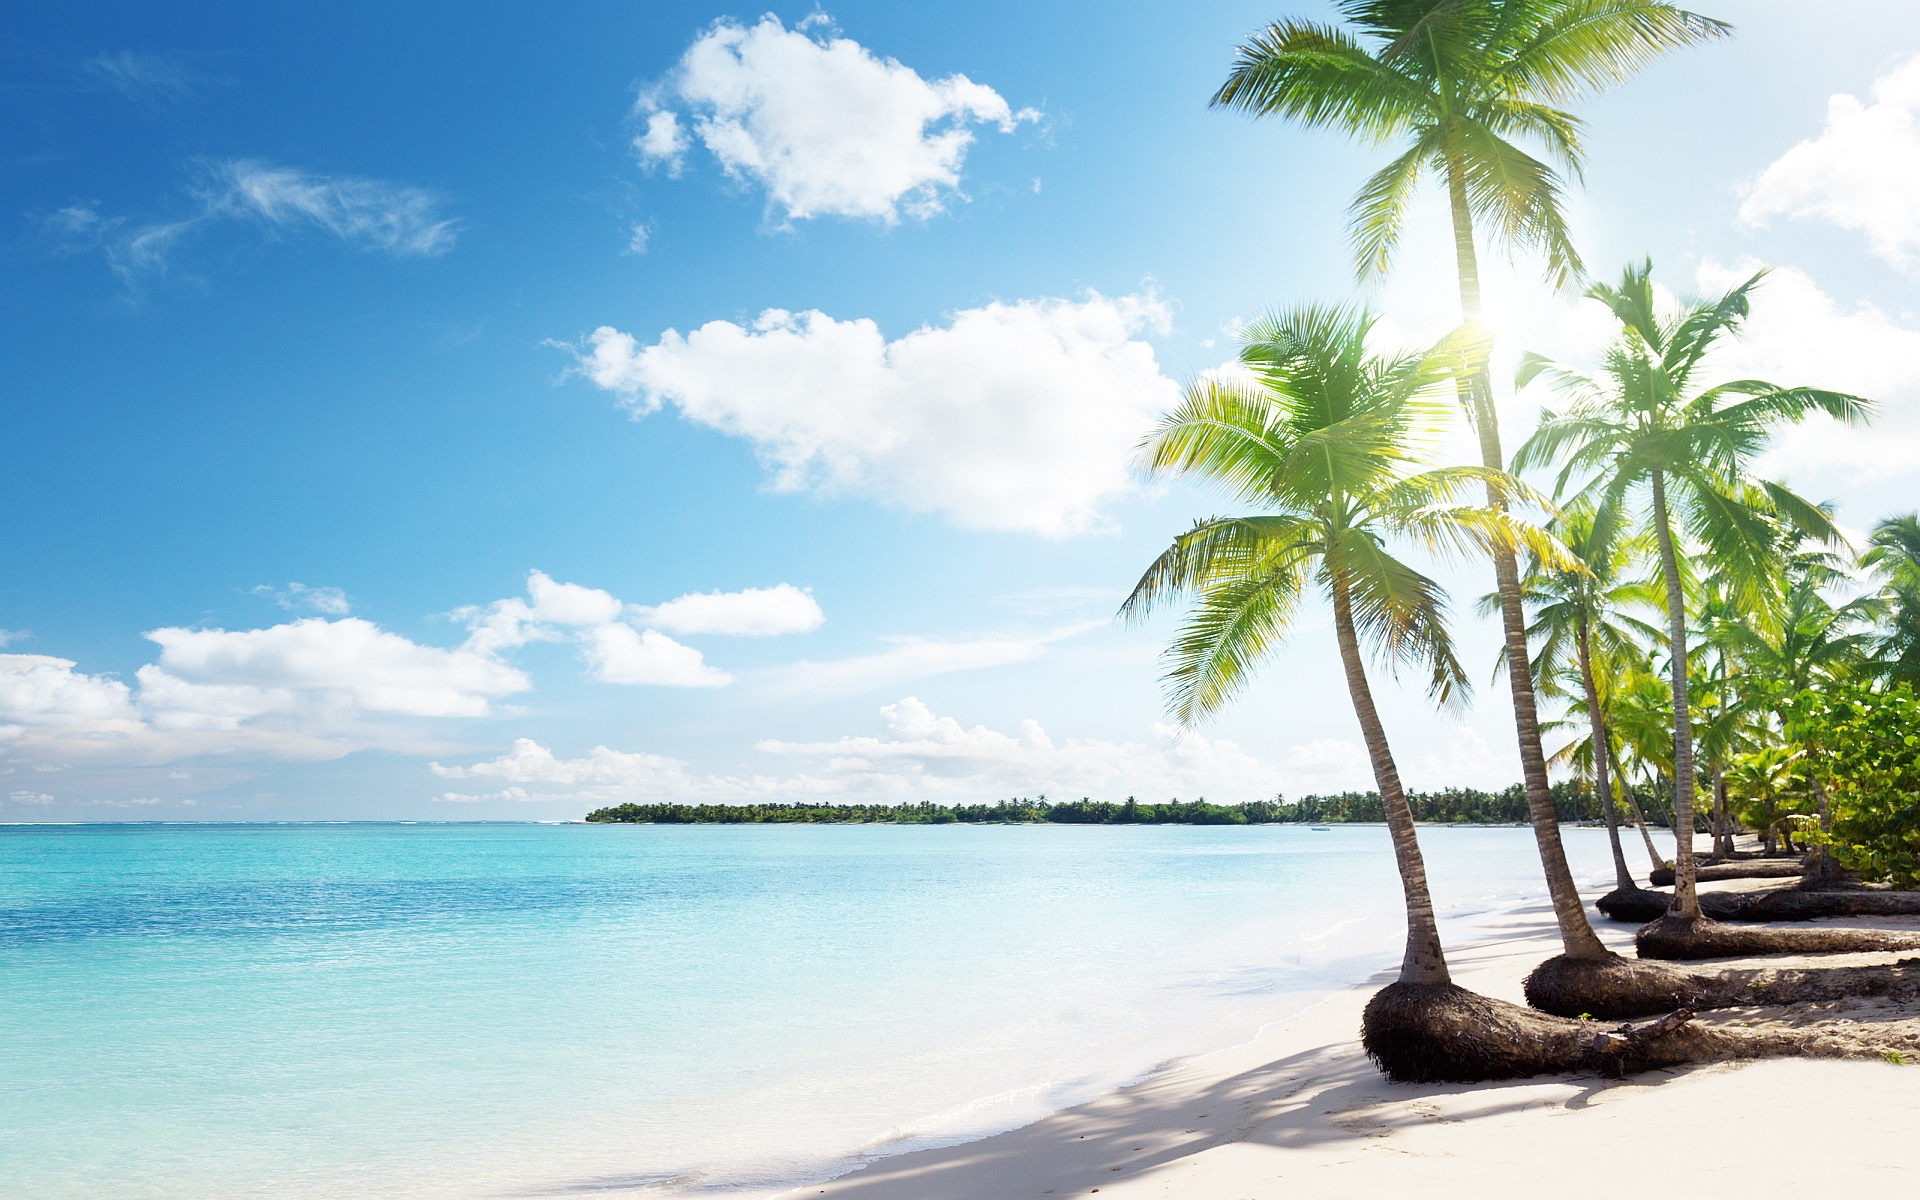 Tropical sand beach palms